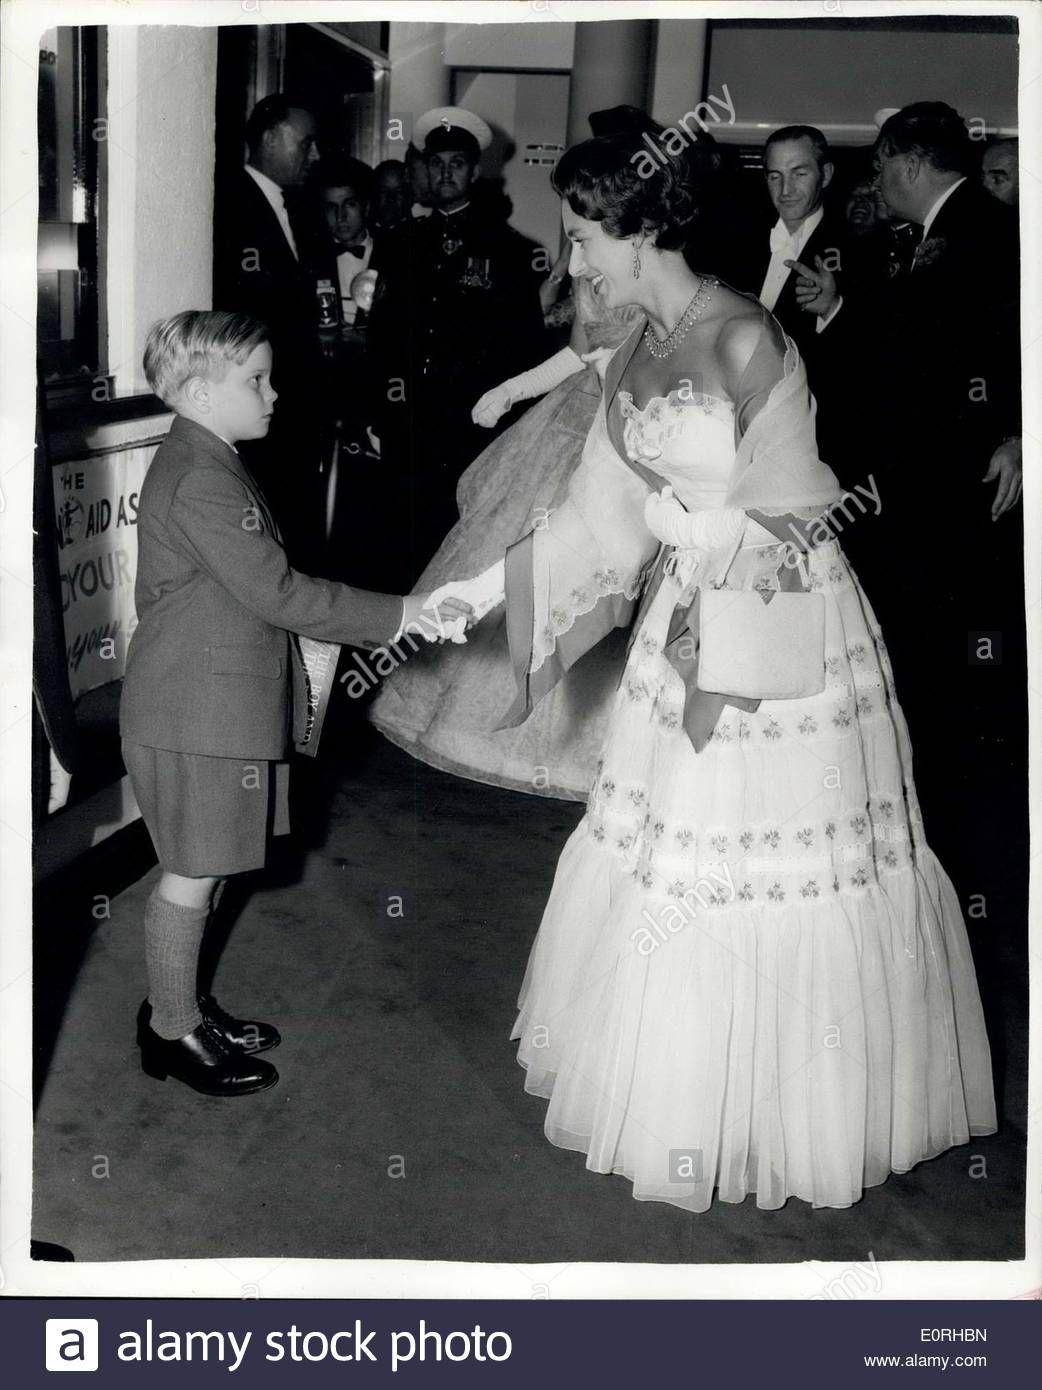 Download this stock image Jul. 22, 1959 Princess